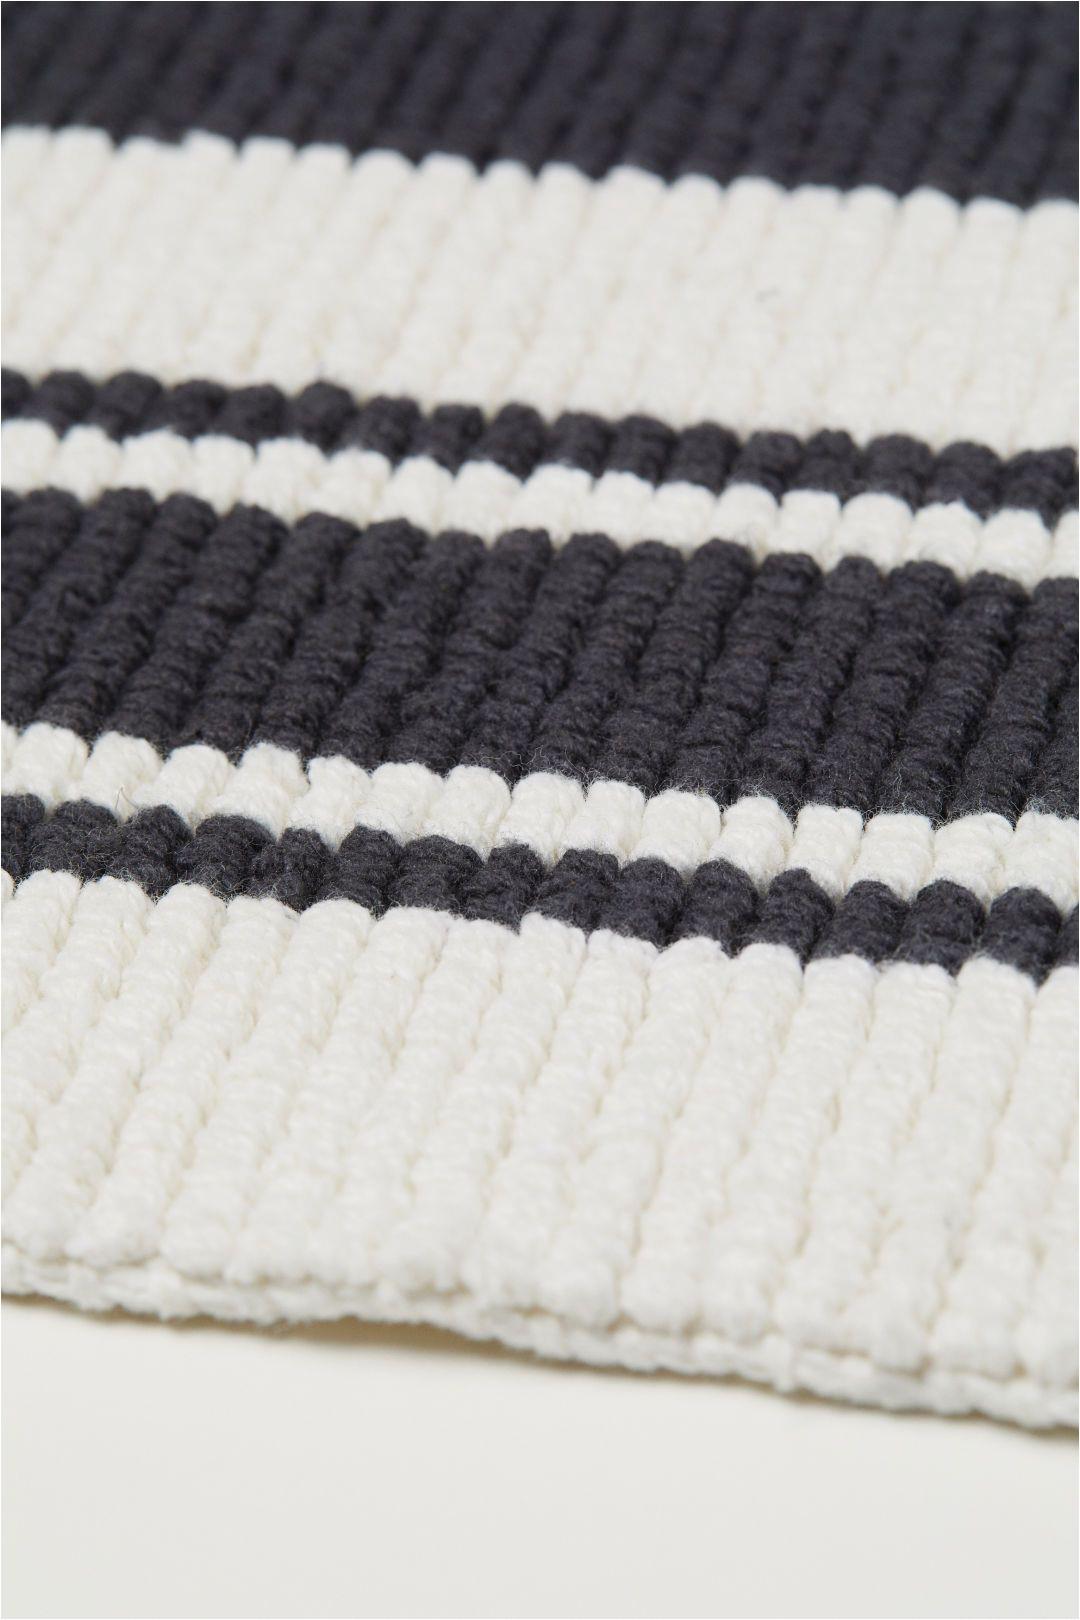 Black Cotton Bath Rug Pin On Bathrooms